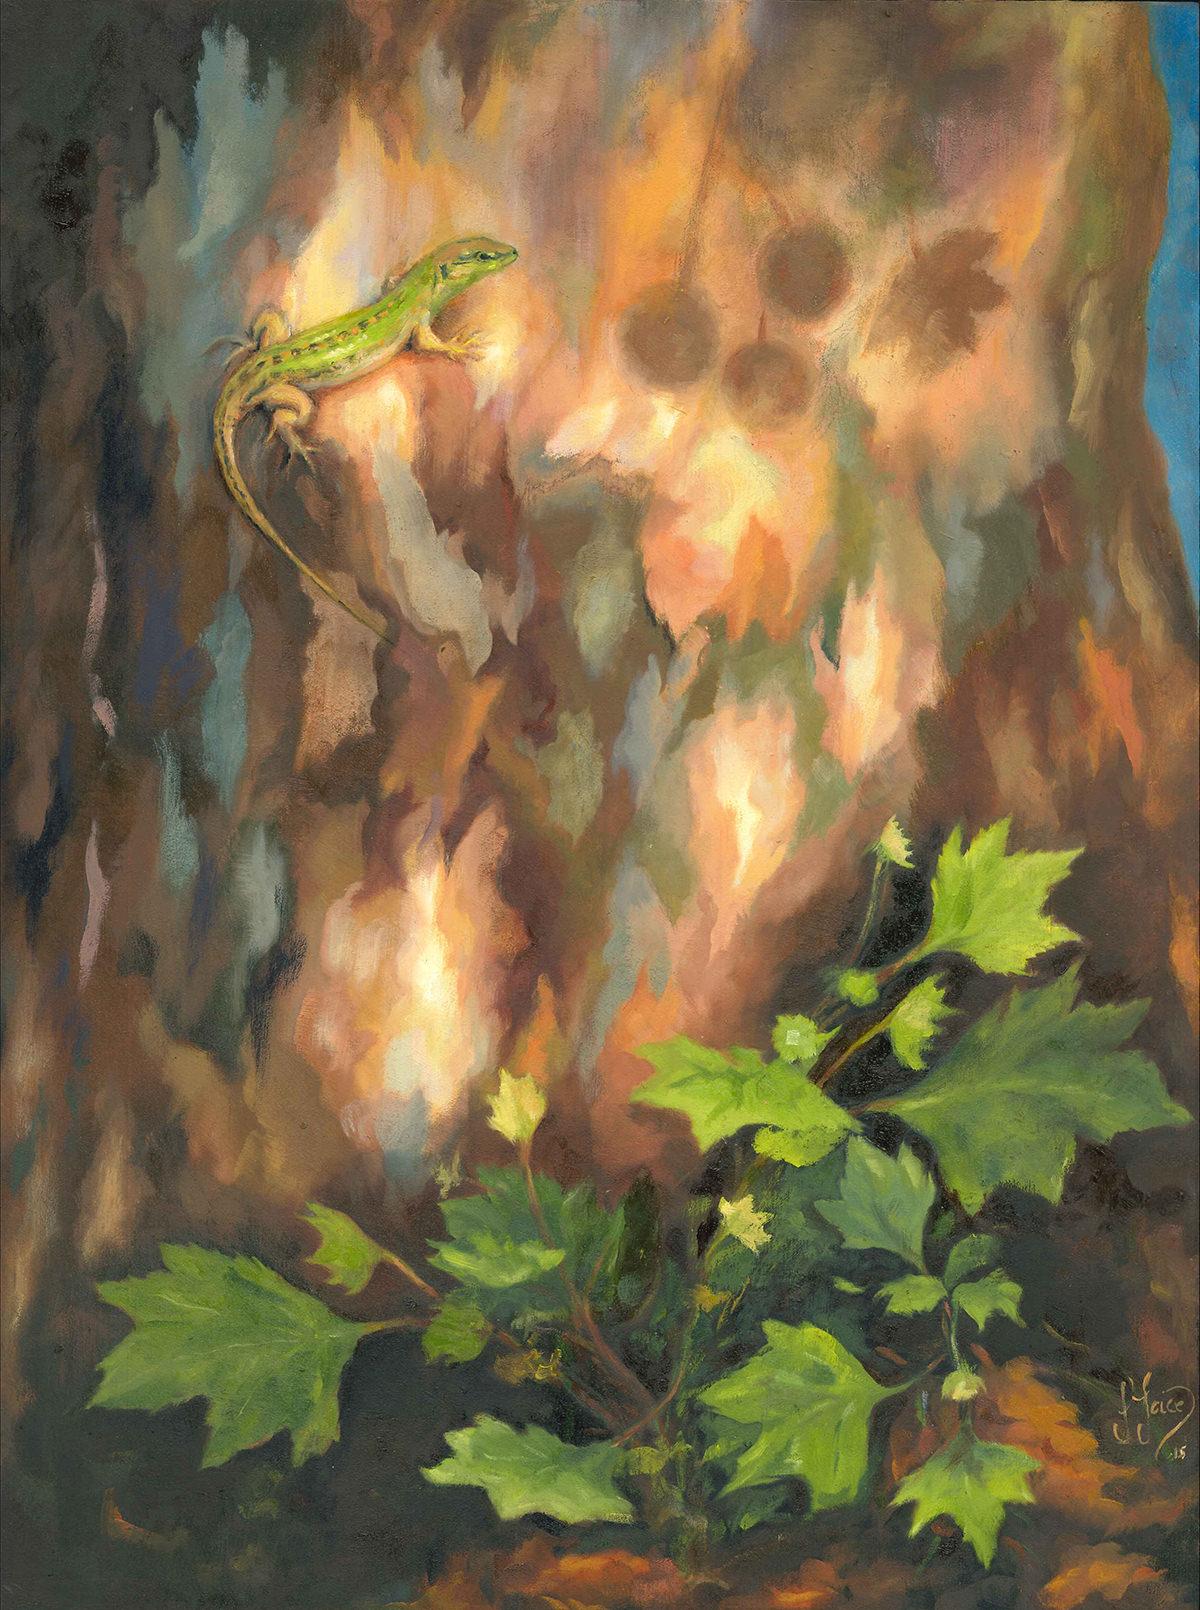 Rhapsody to a Plane Tree - Oil on wood - 40 x 30 cm